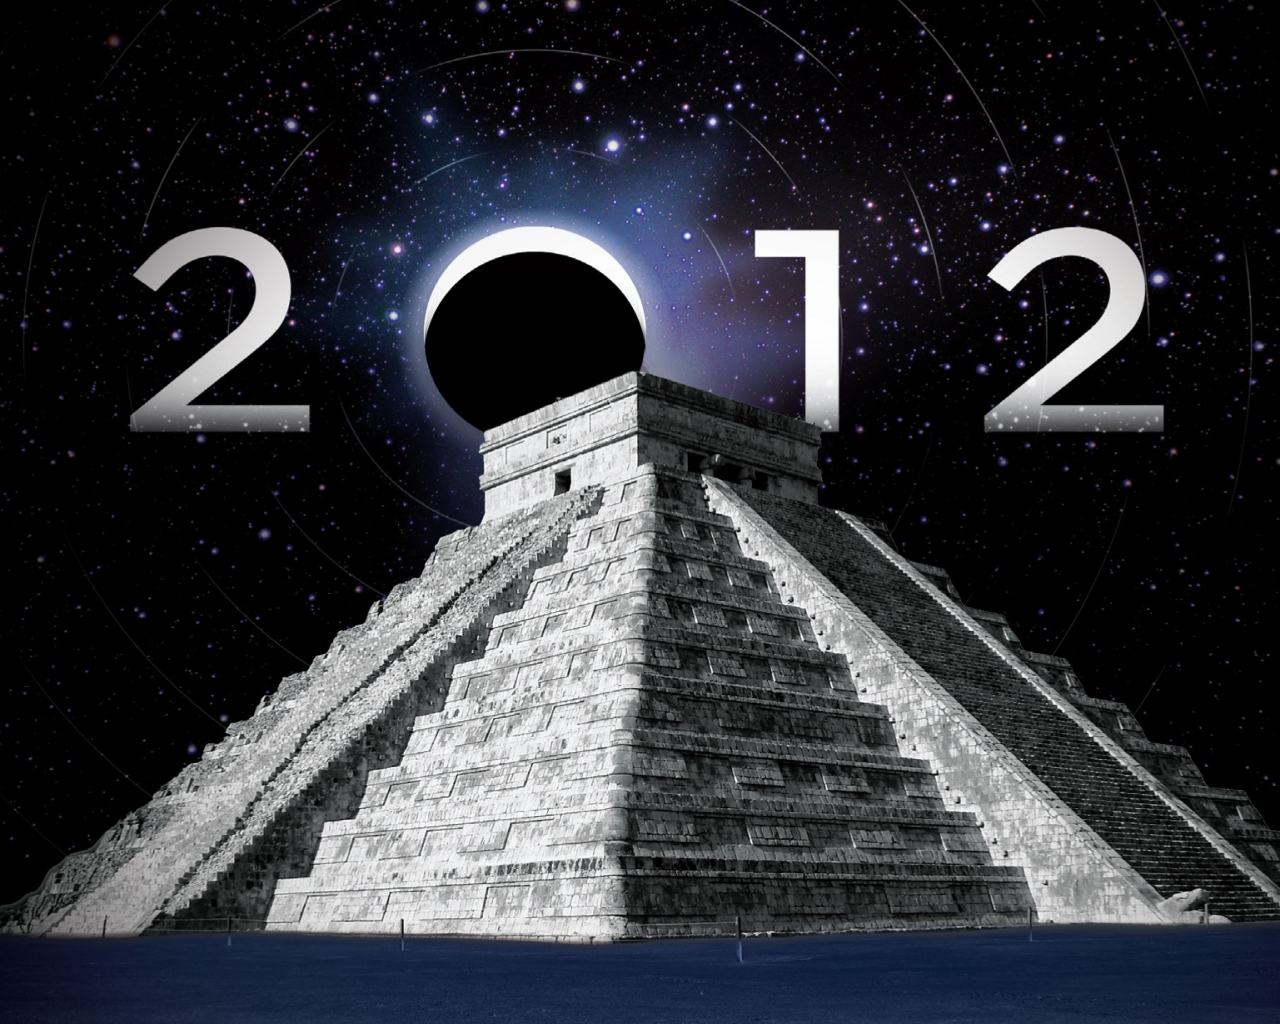 http://1.bp.blogspot.com/-wgaW8au7ypA/To23OsLnoqI/AAAAAAAAAN4/MUlXwWYPxCk/s1600/2012-wallpaper.jpg